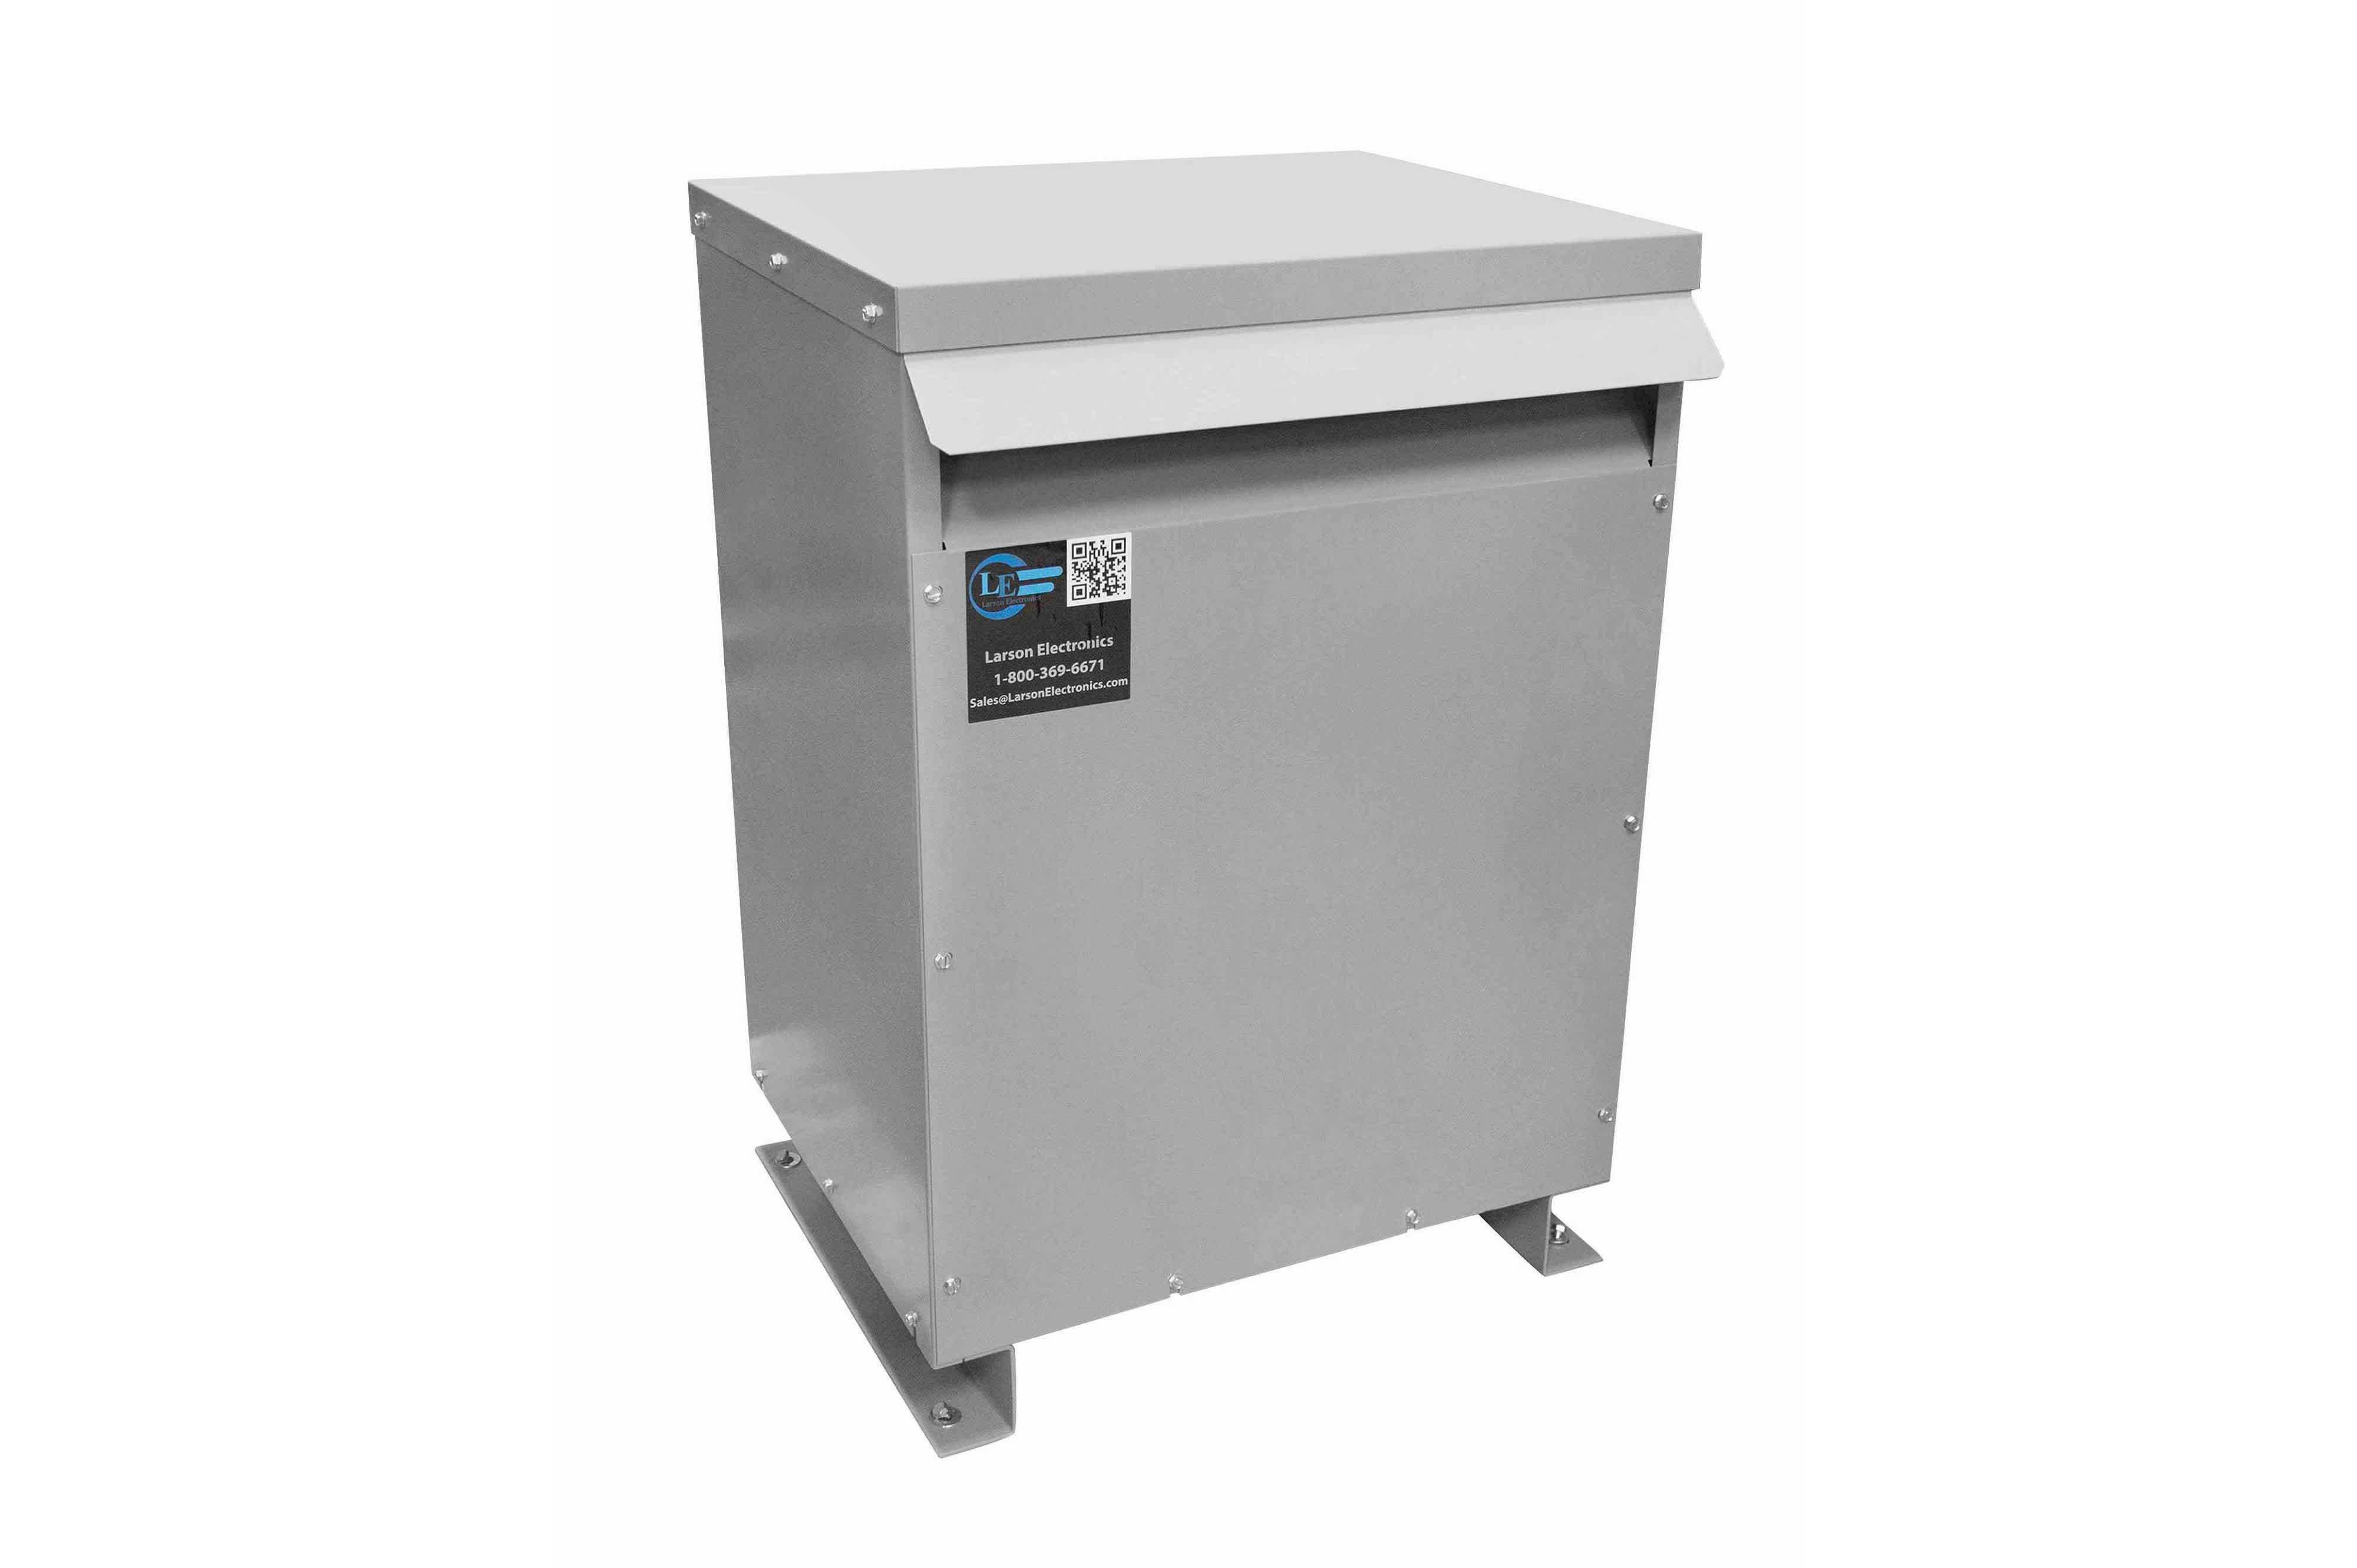 52.5 kVA 3PH Isolation Transformer, 208V Wye Primary, 400Y/231 Wye-N Secondary, N3R, Ventilated, 60 Hz